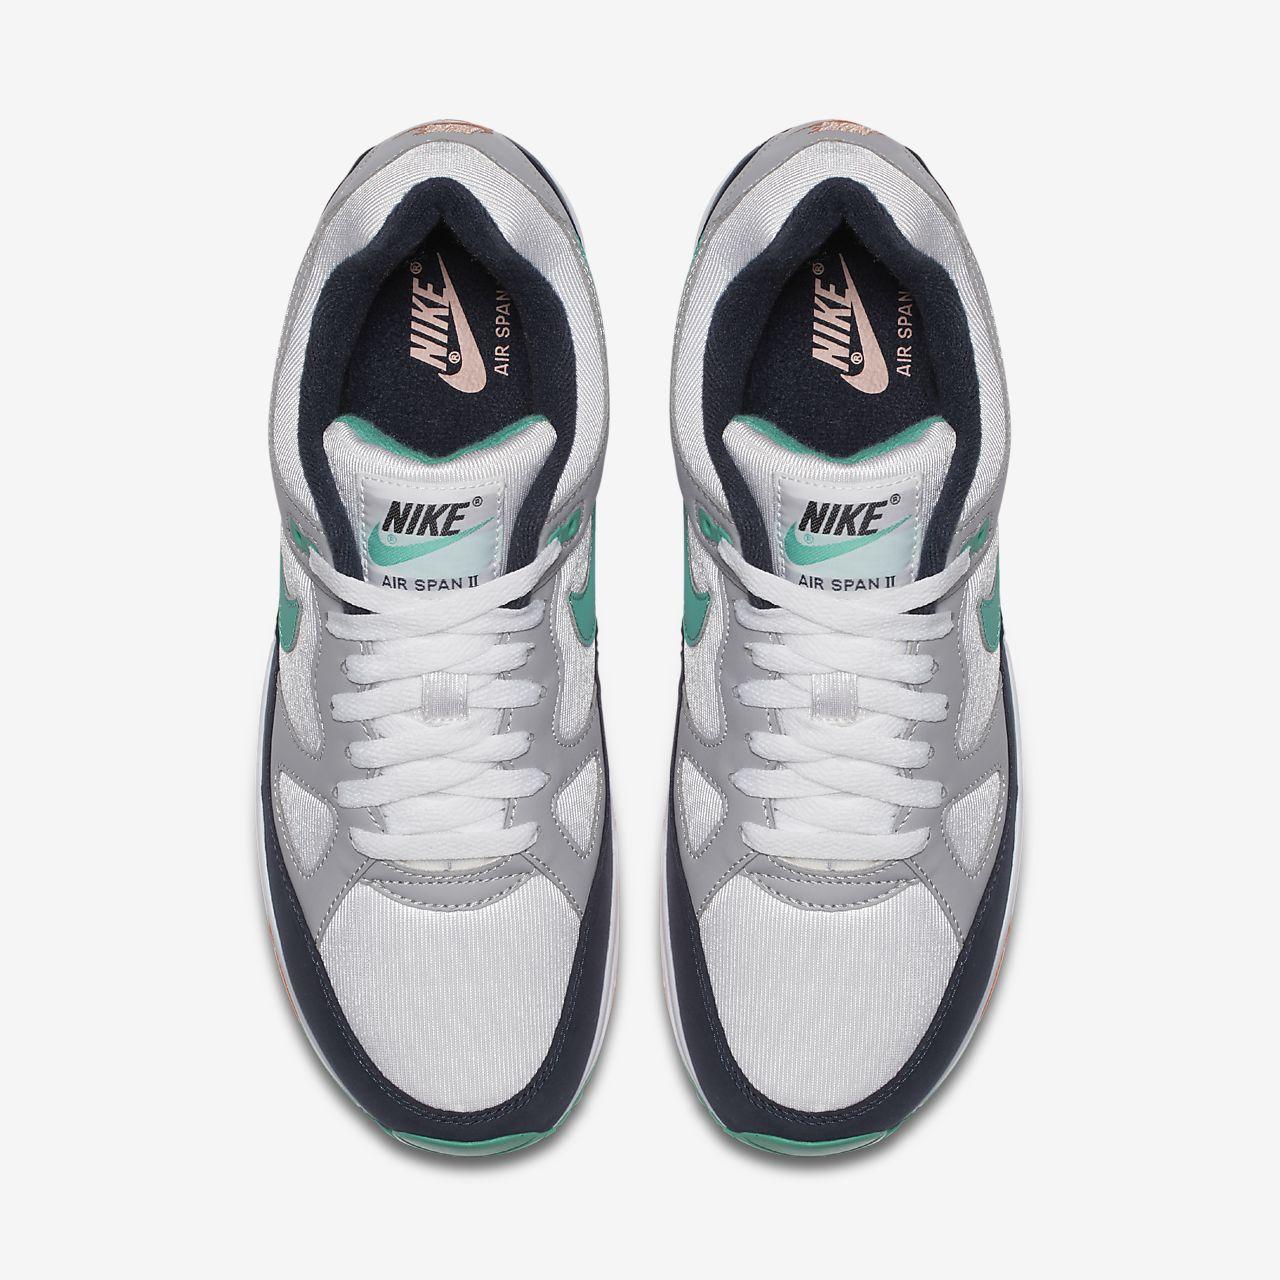 Air Span Ii Mesh Sneakers Nike 21SEk